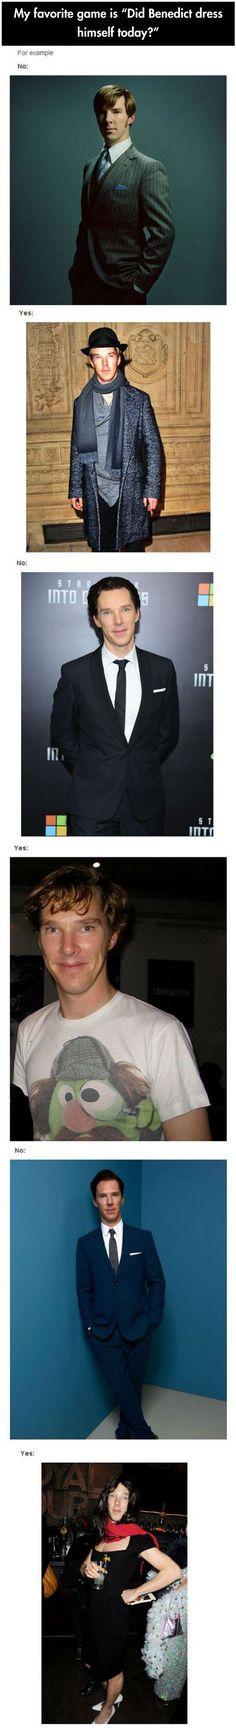 Did Benedict dress himself today?